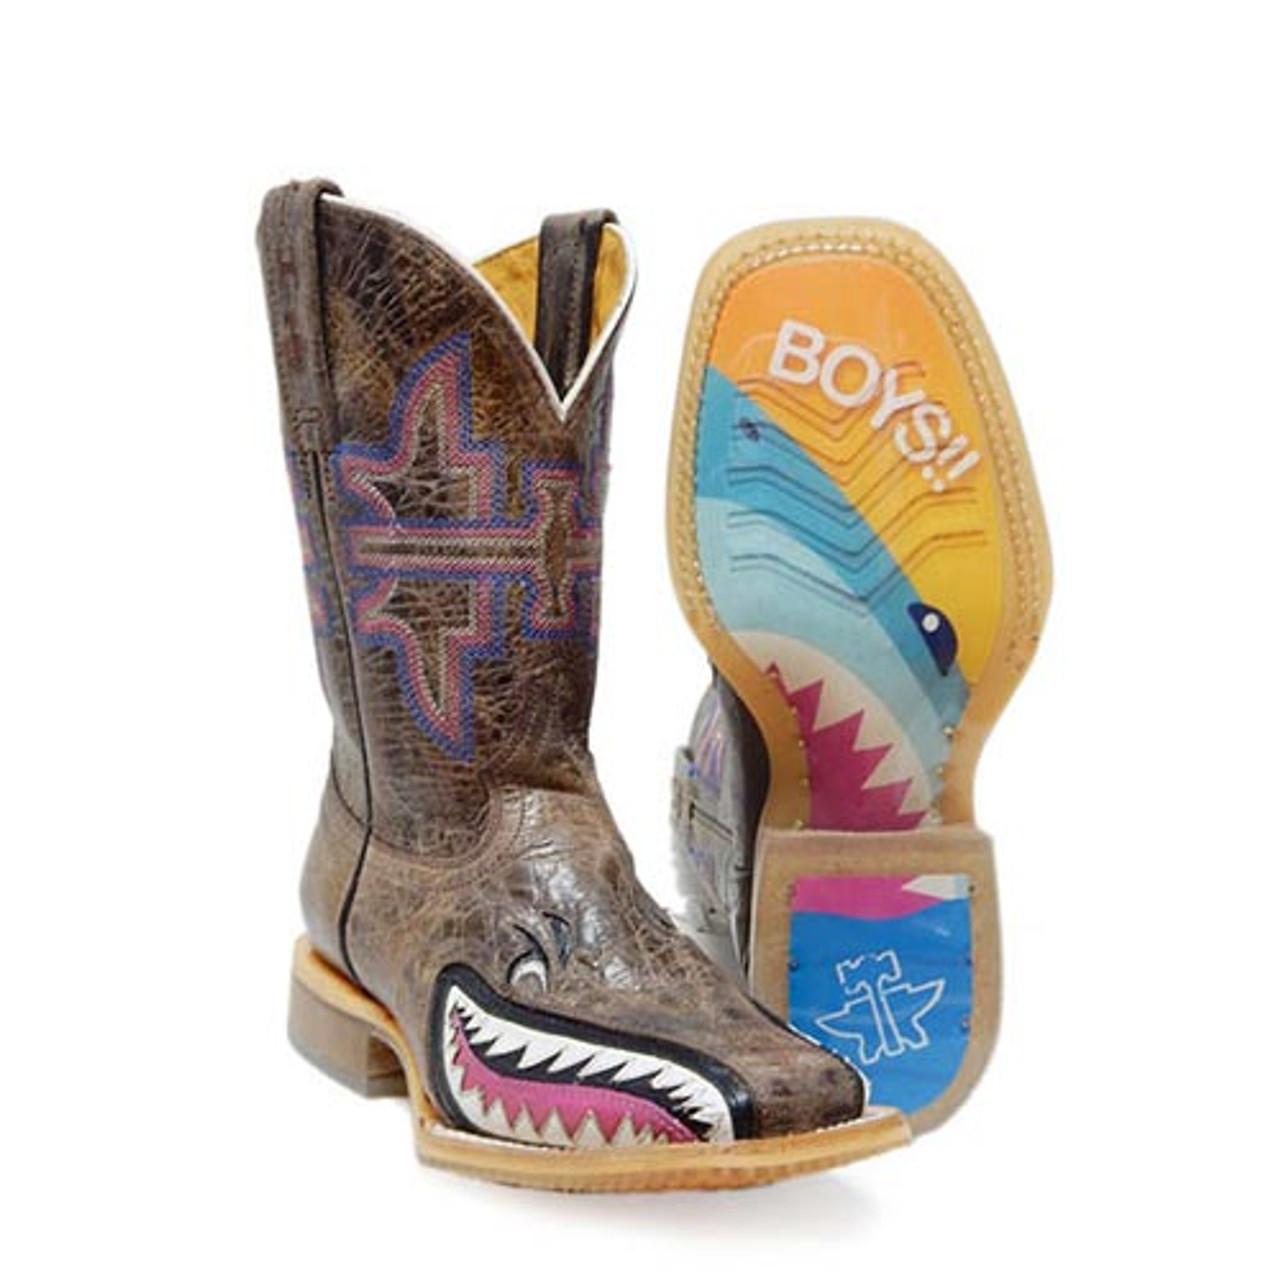 1b086a13302 Tin Haul Kids Boots - I Don't Bite w/ Jawsome Sole